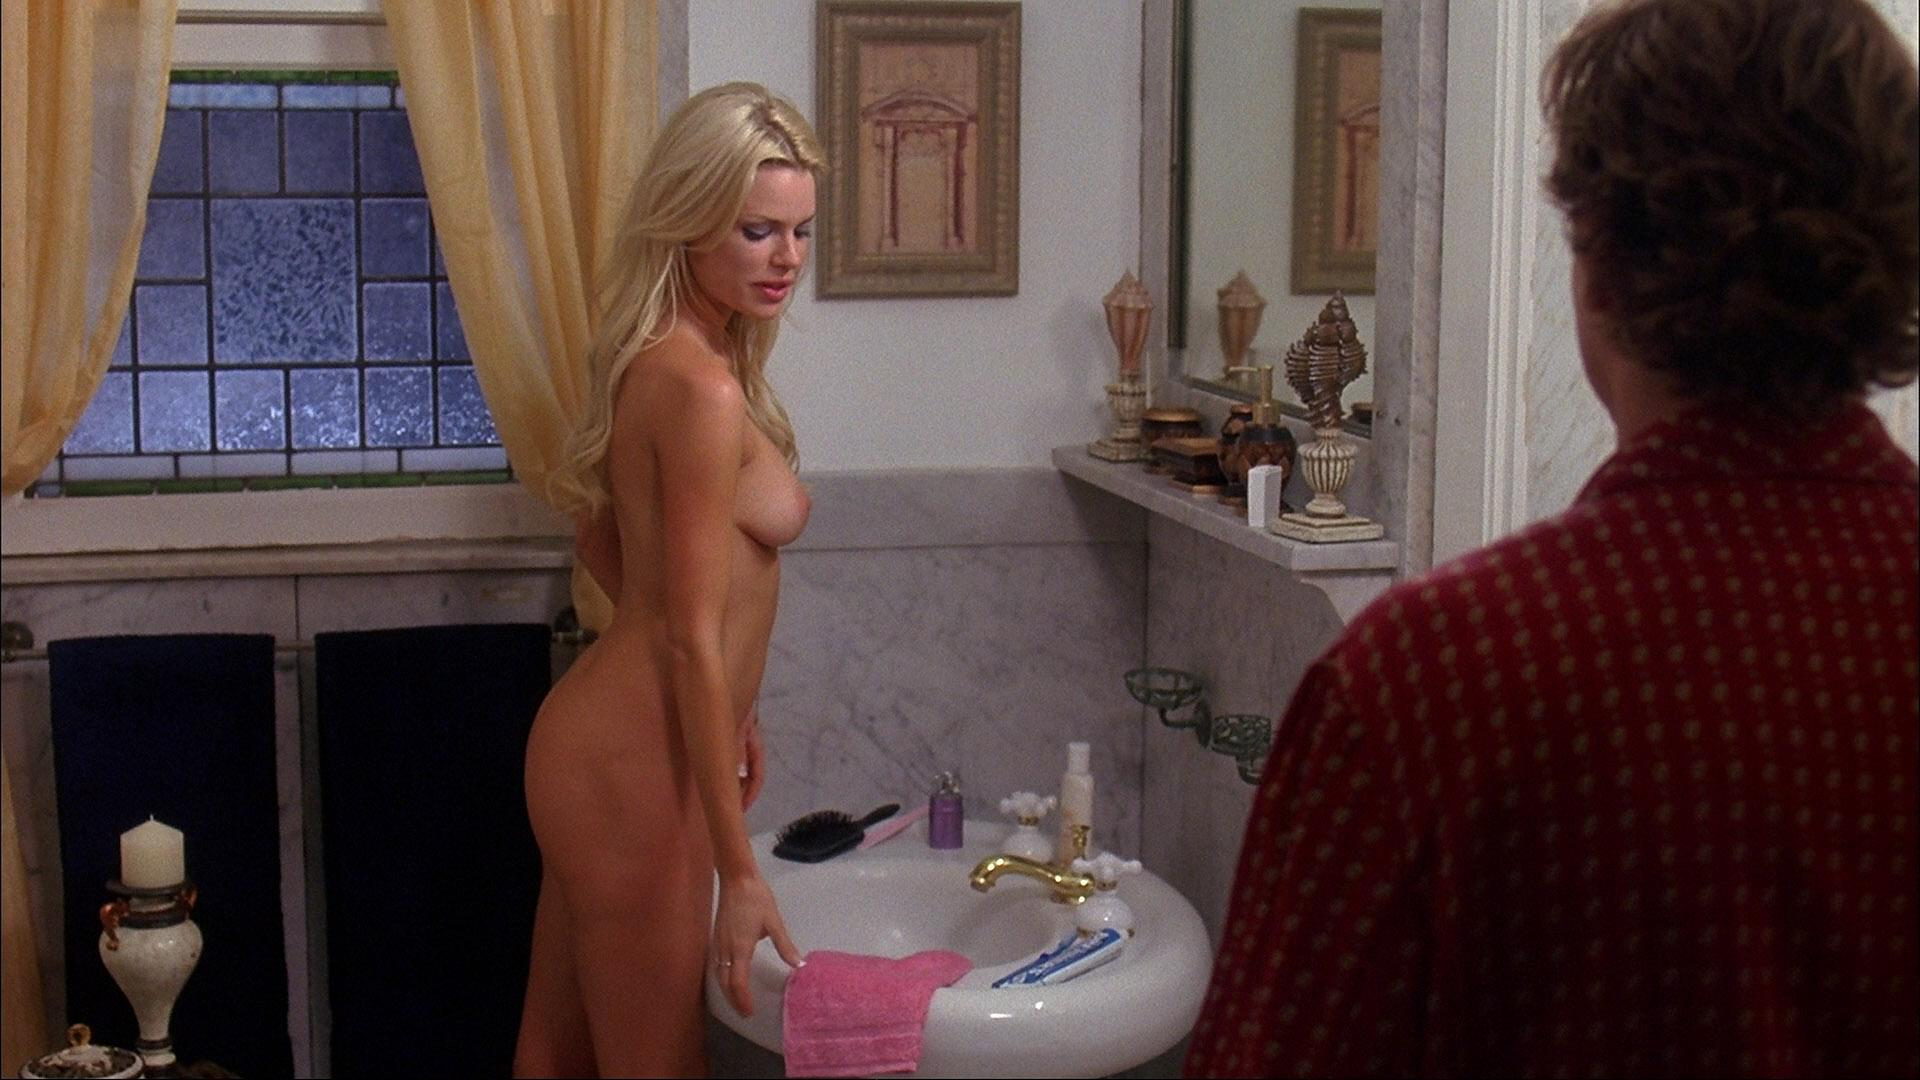 Monk fuck sex tape adult slut